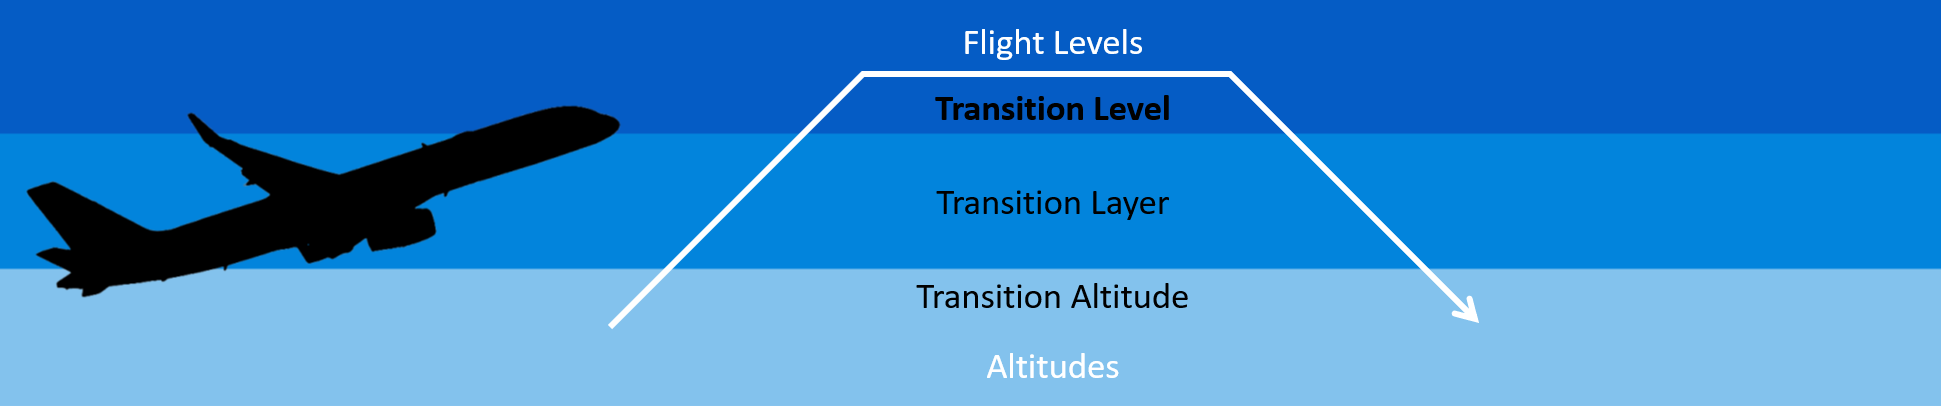 Transition Level explanation